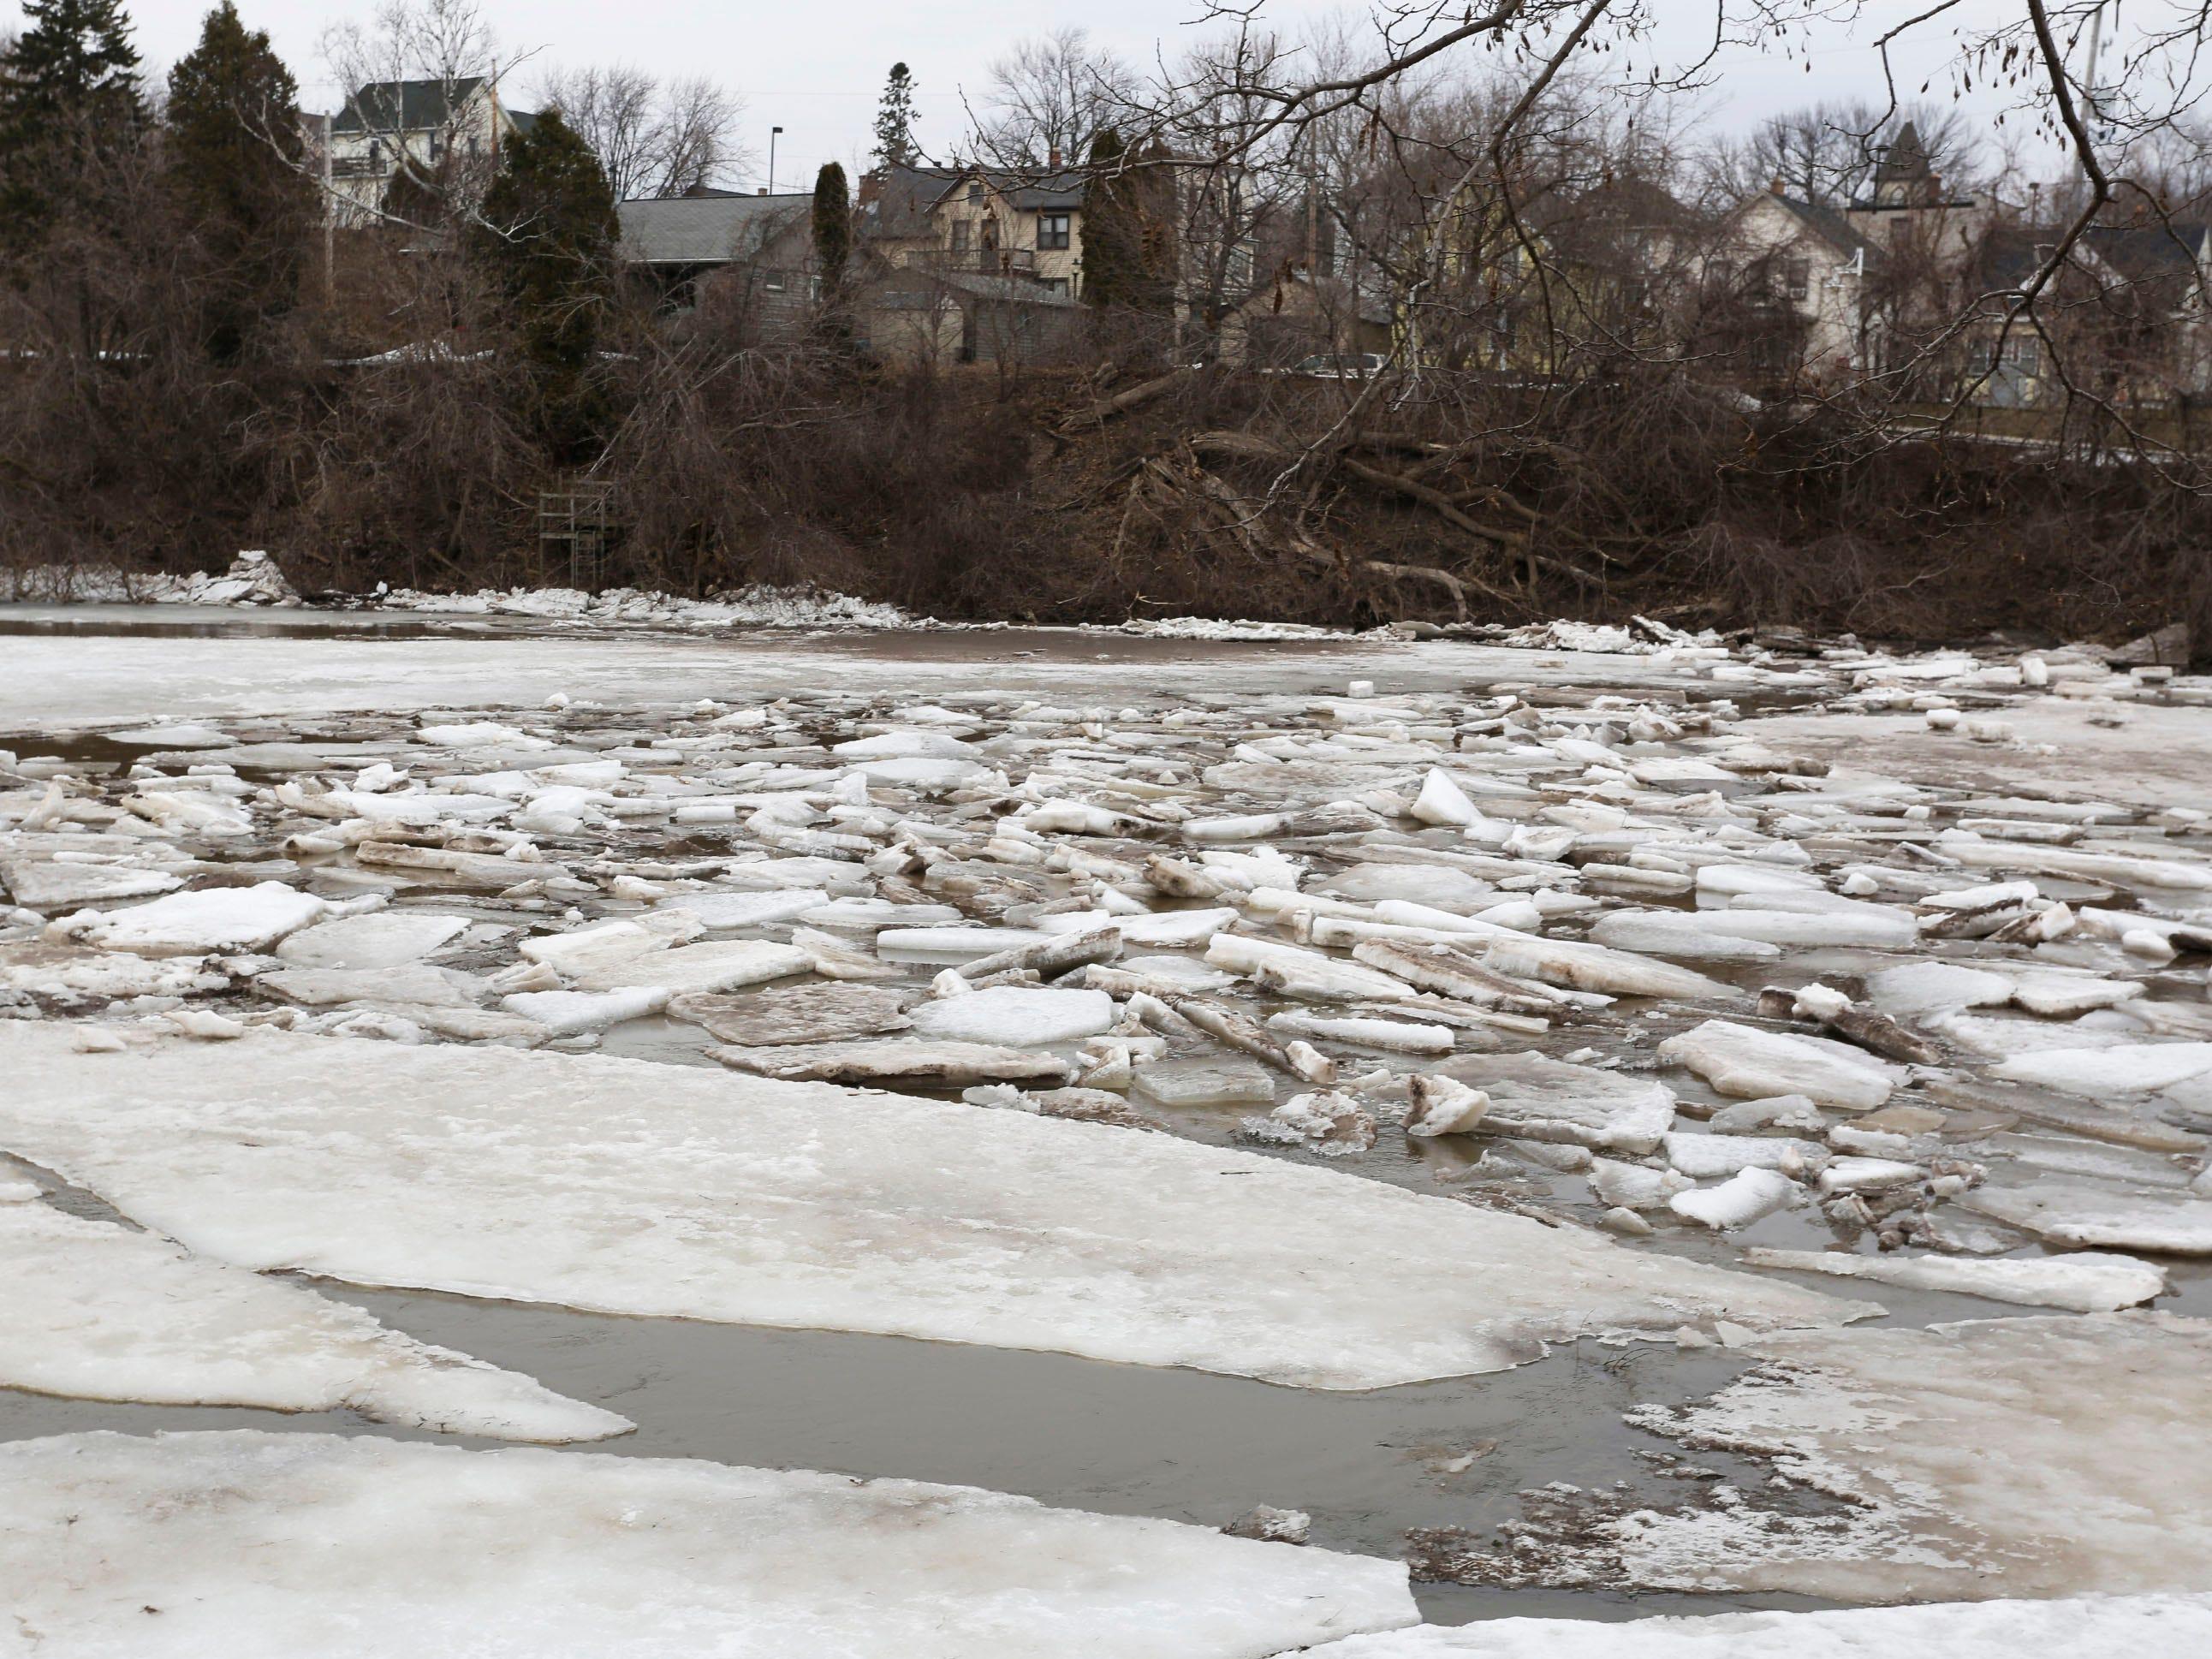 Ice jams on the Sheboygan River at Kiwanis Park, Wednesday, March 20, 2019, in Sheboygan, Wis.